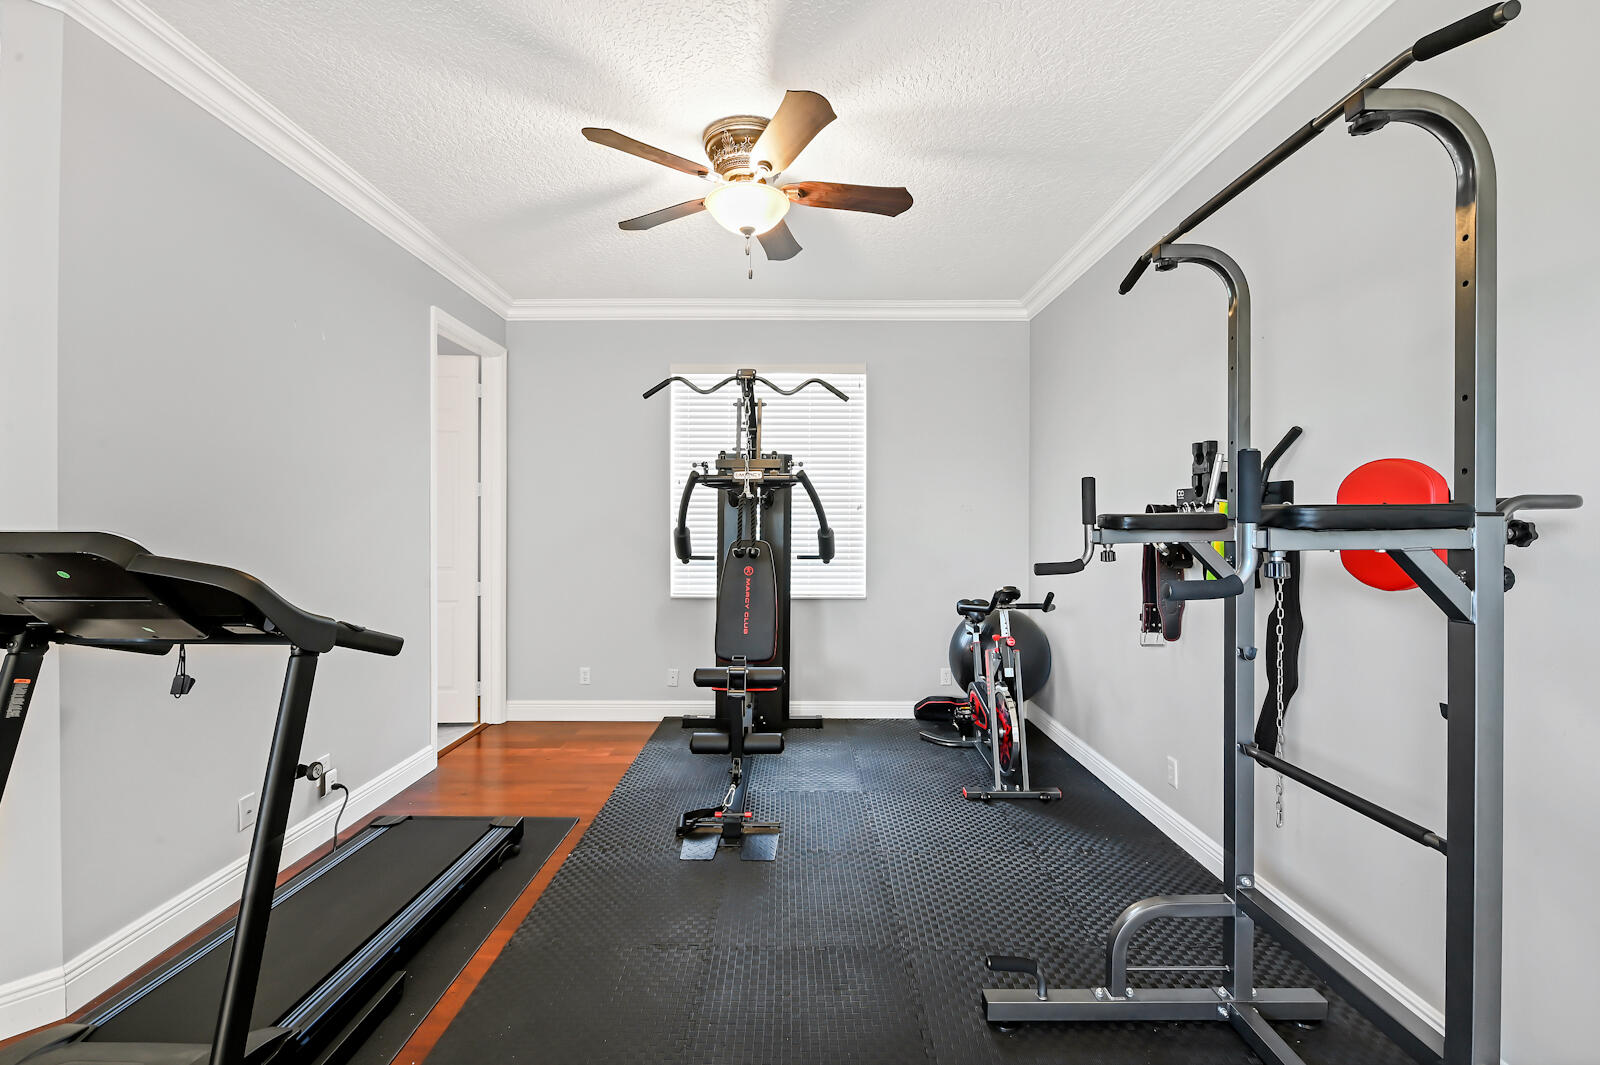 29 Gym Room 01